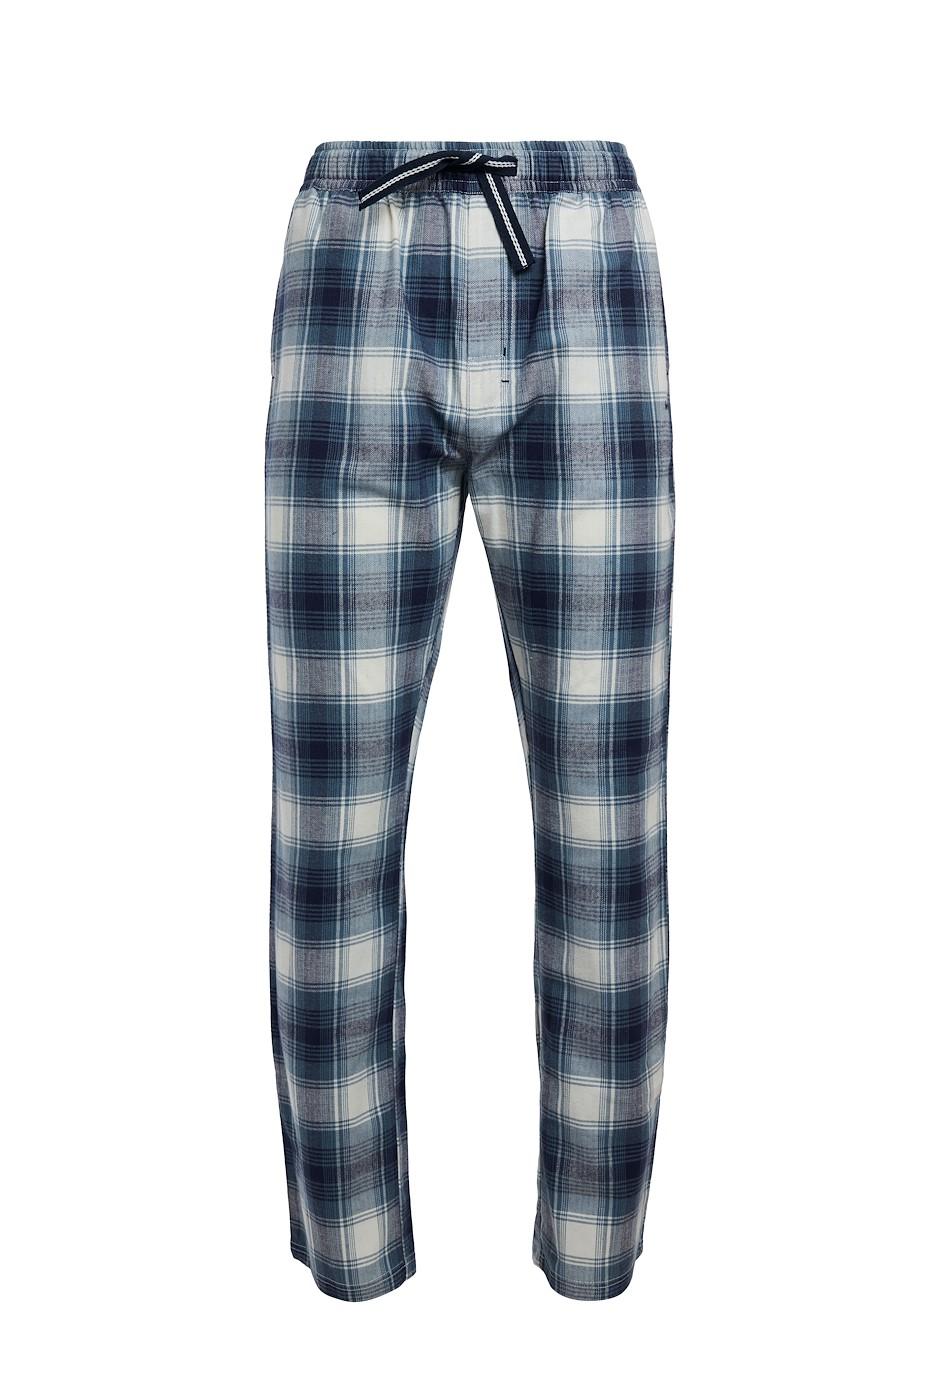 Gilmore Organic Woven Check Trouser Blue Mirage